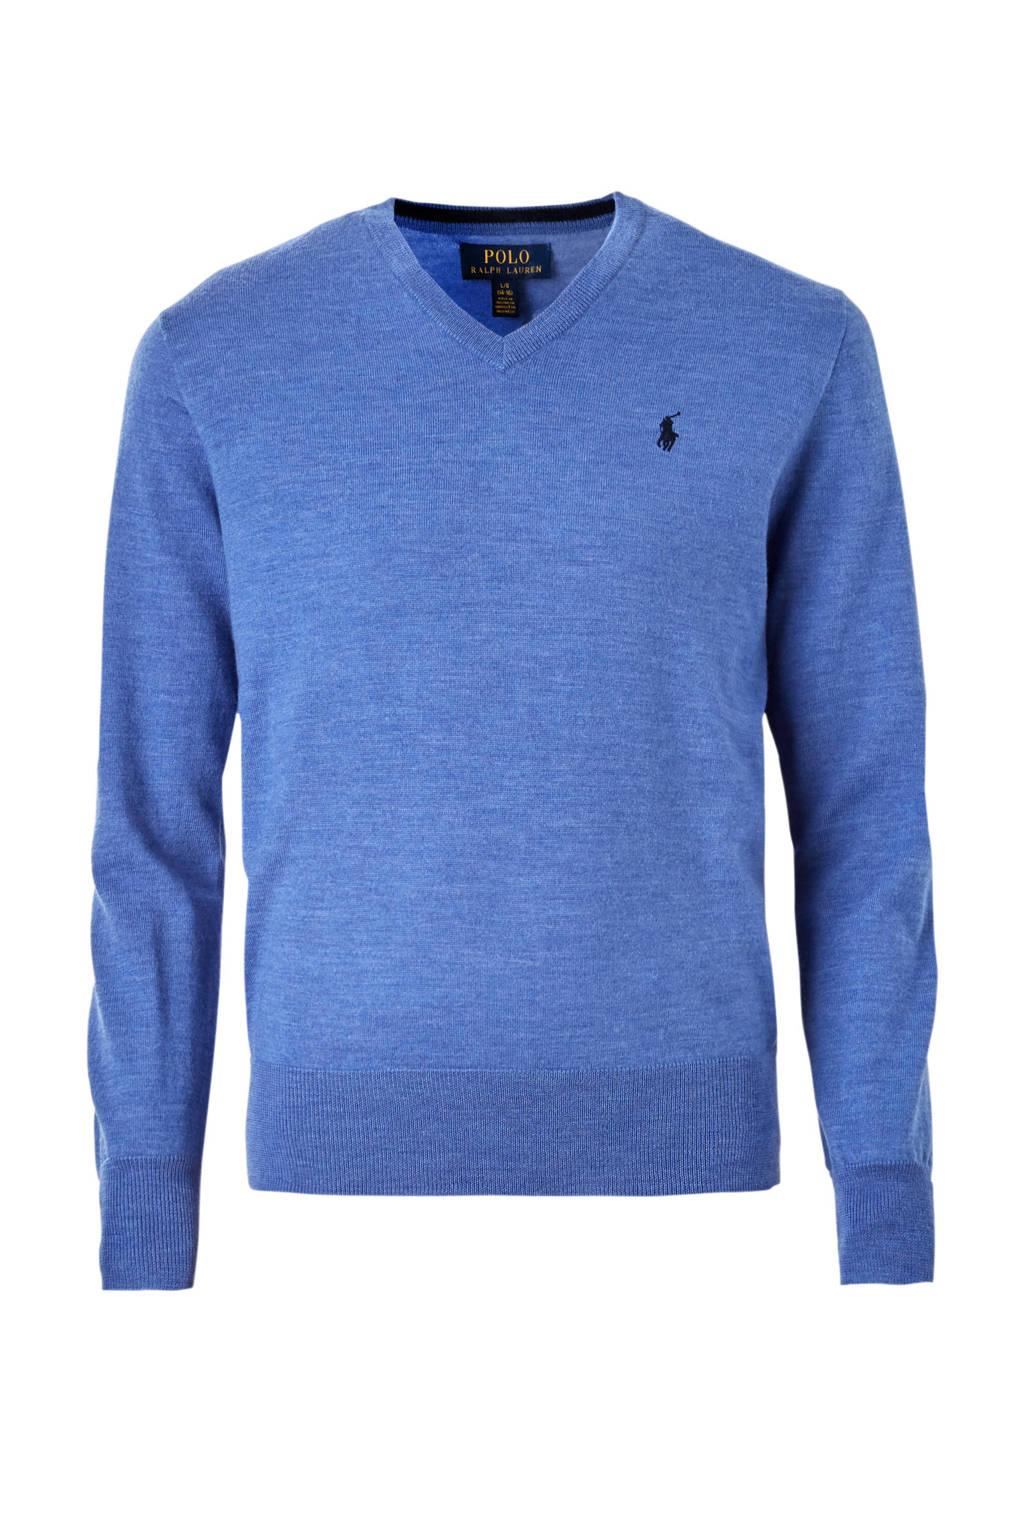 POLO Ralph Lauren wollen trui middenblauw